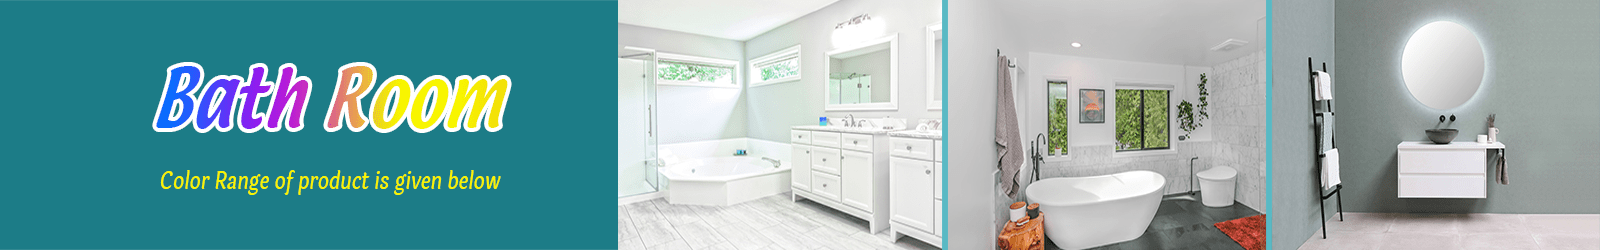 Bath Room-min